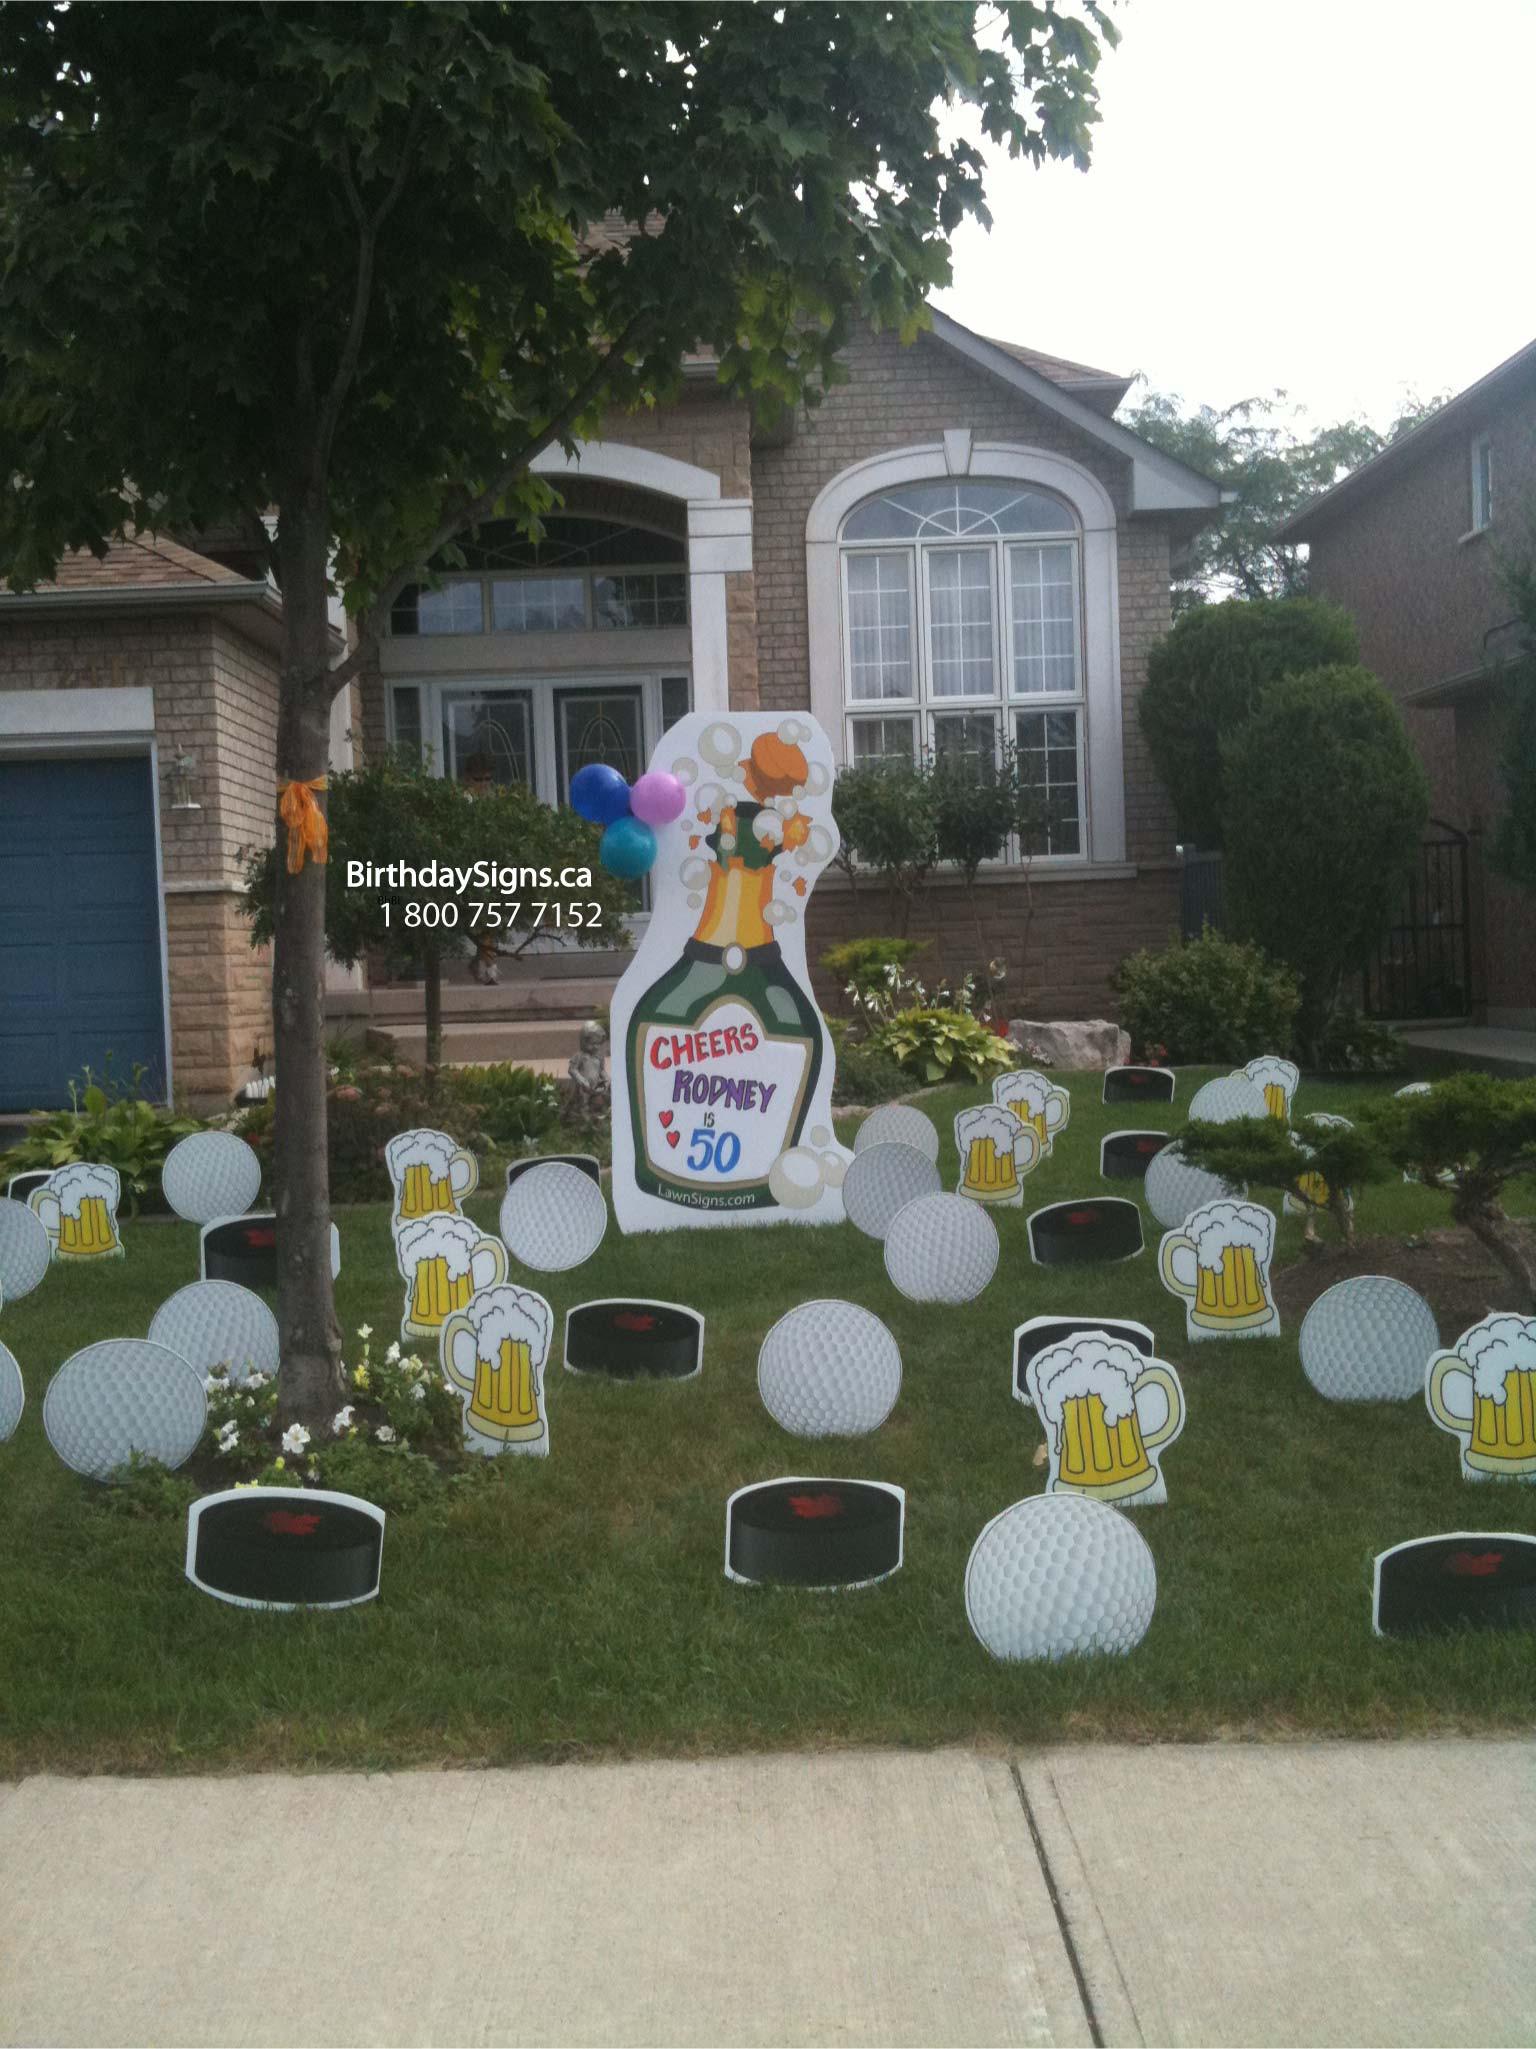 Lawn Decorations For Birthday  Birthday Yard Signs Lawn Greetings